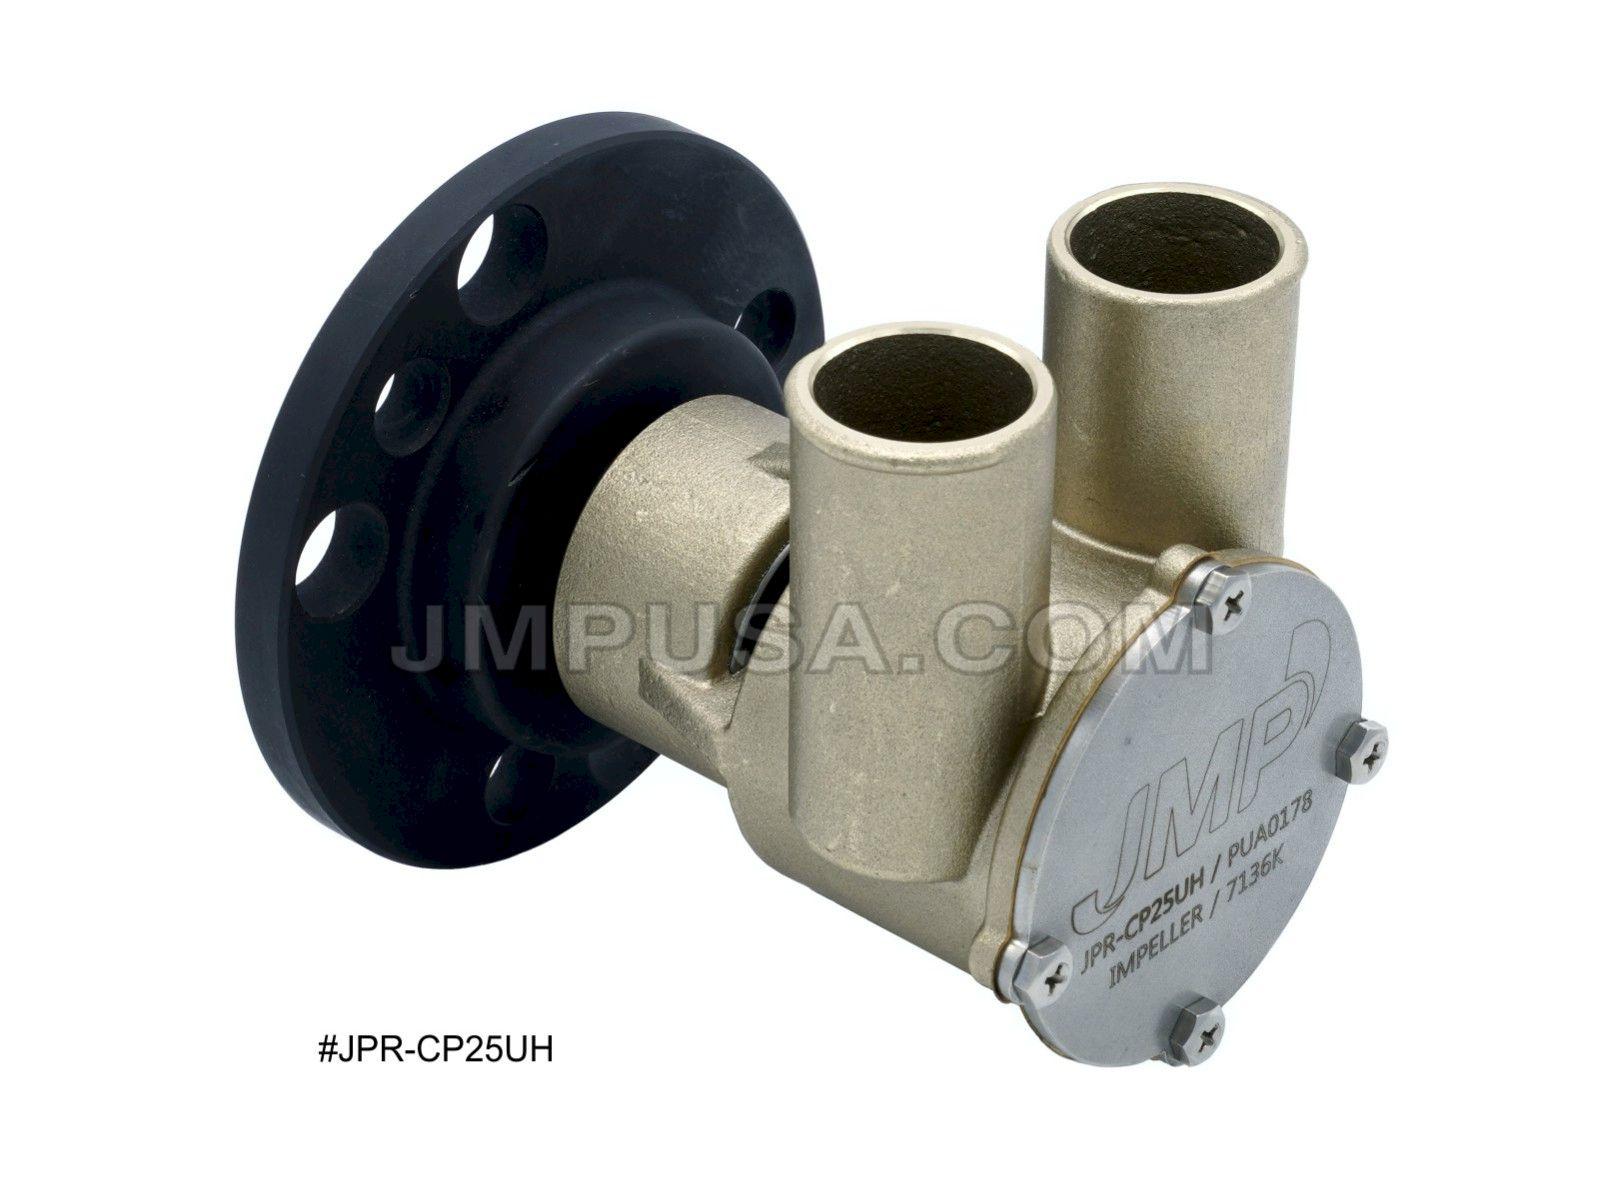 unigom F8986/Sleeve Connector Pump